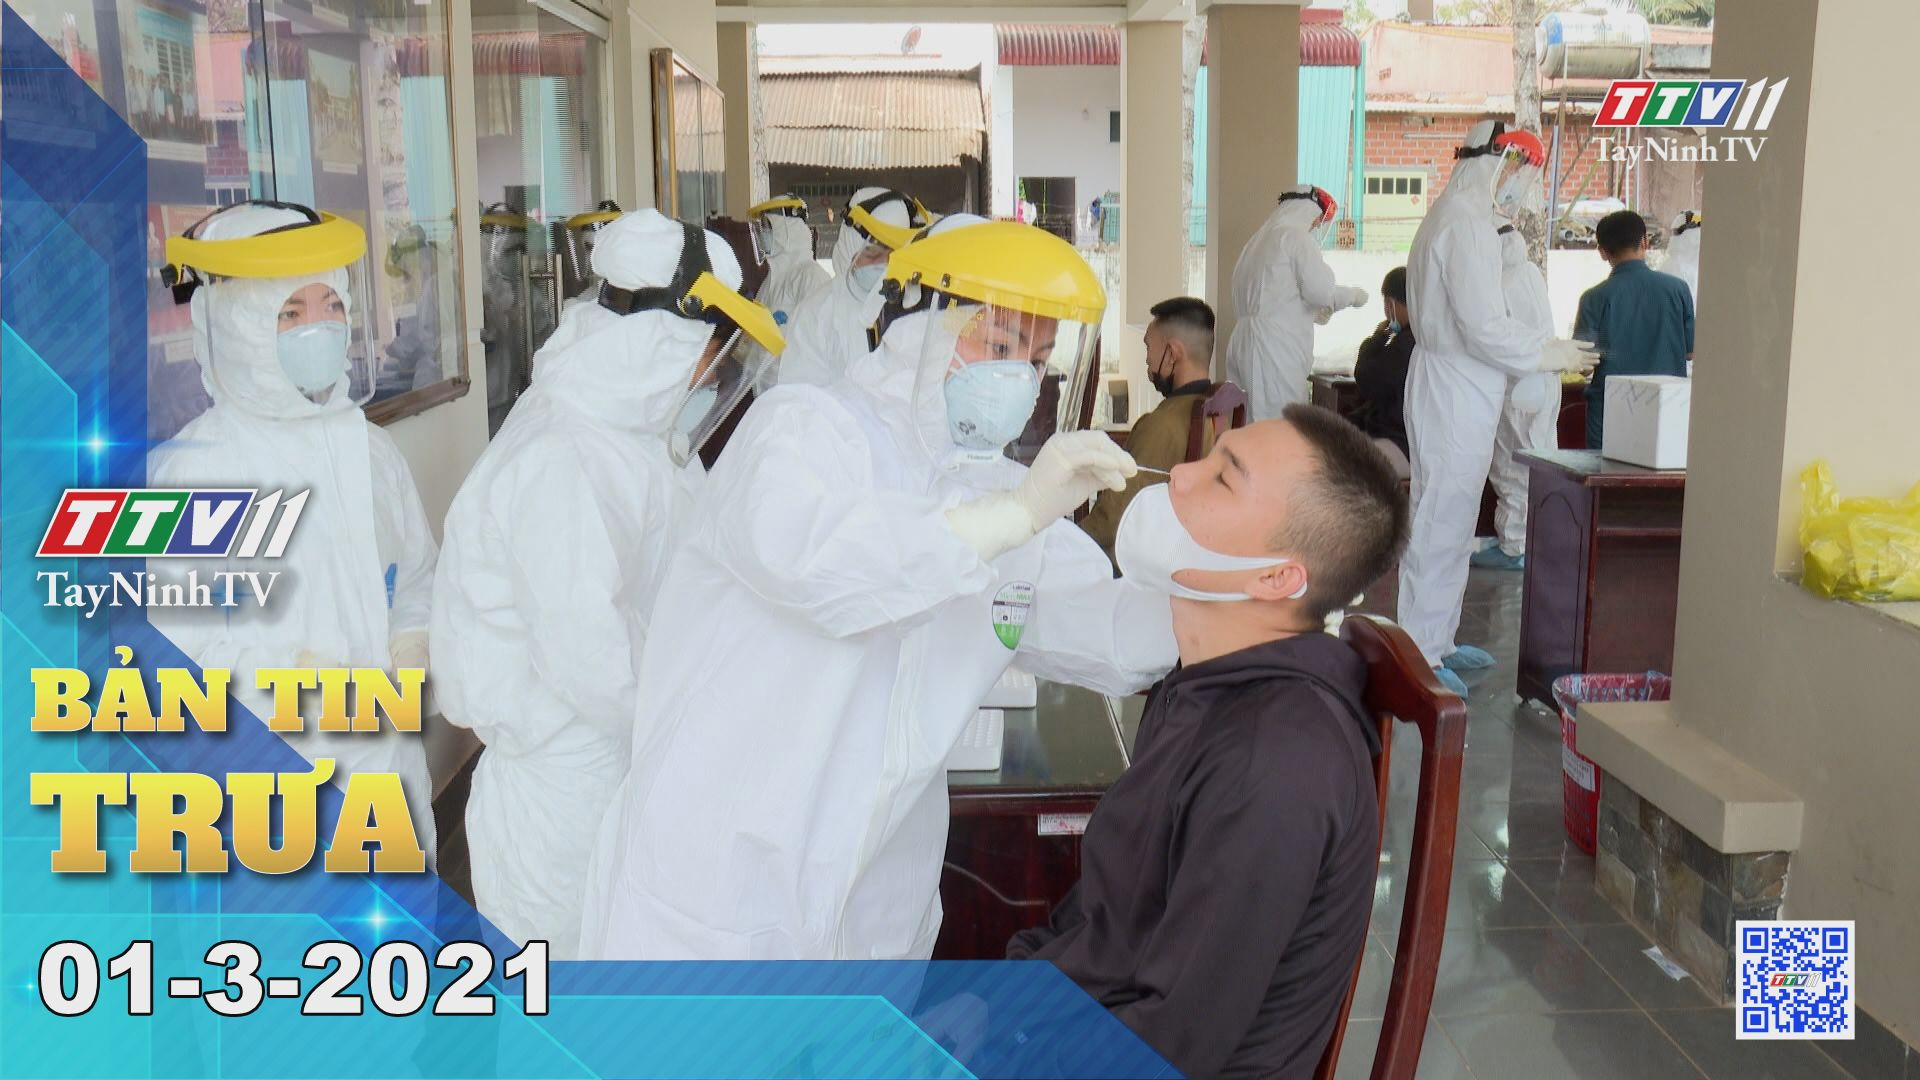 Bản tin trưa 01-3-2021 | Tin tức hôm nay | TayNinhTV